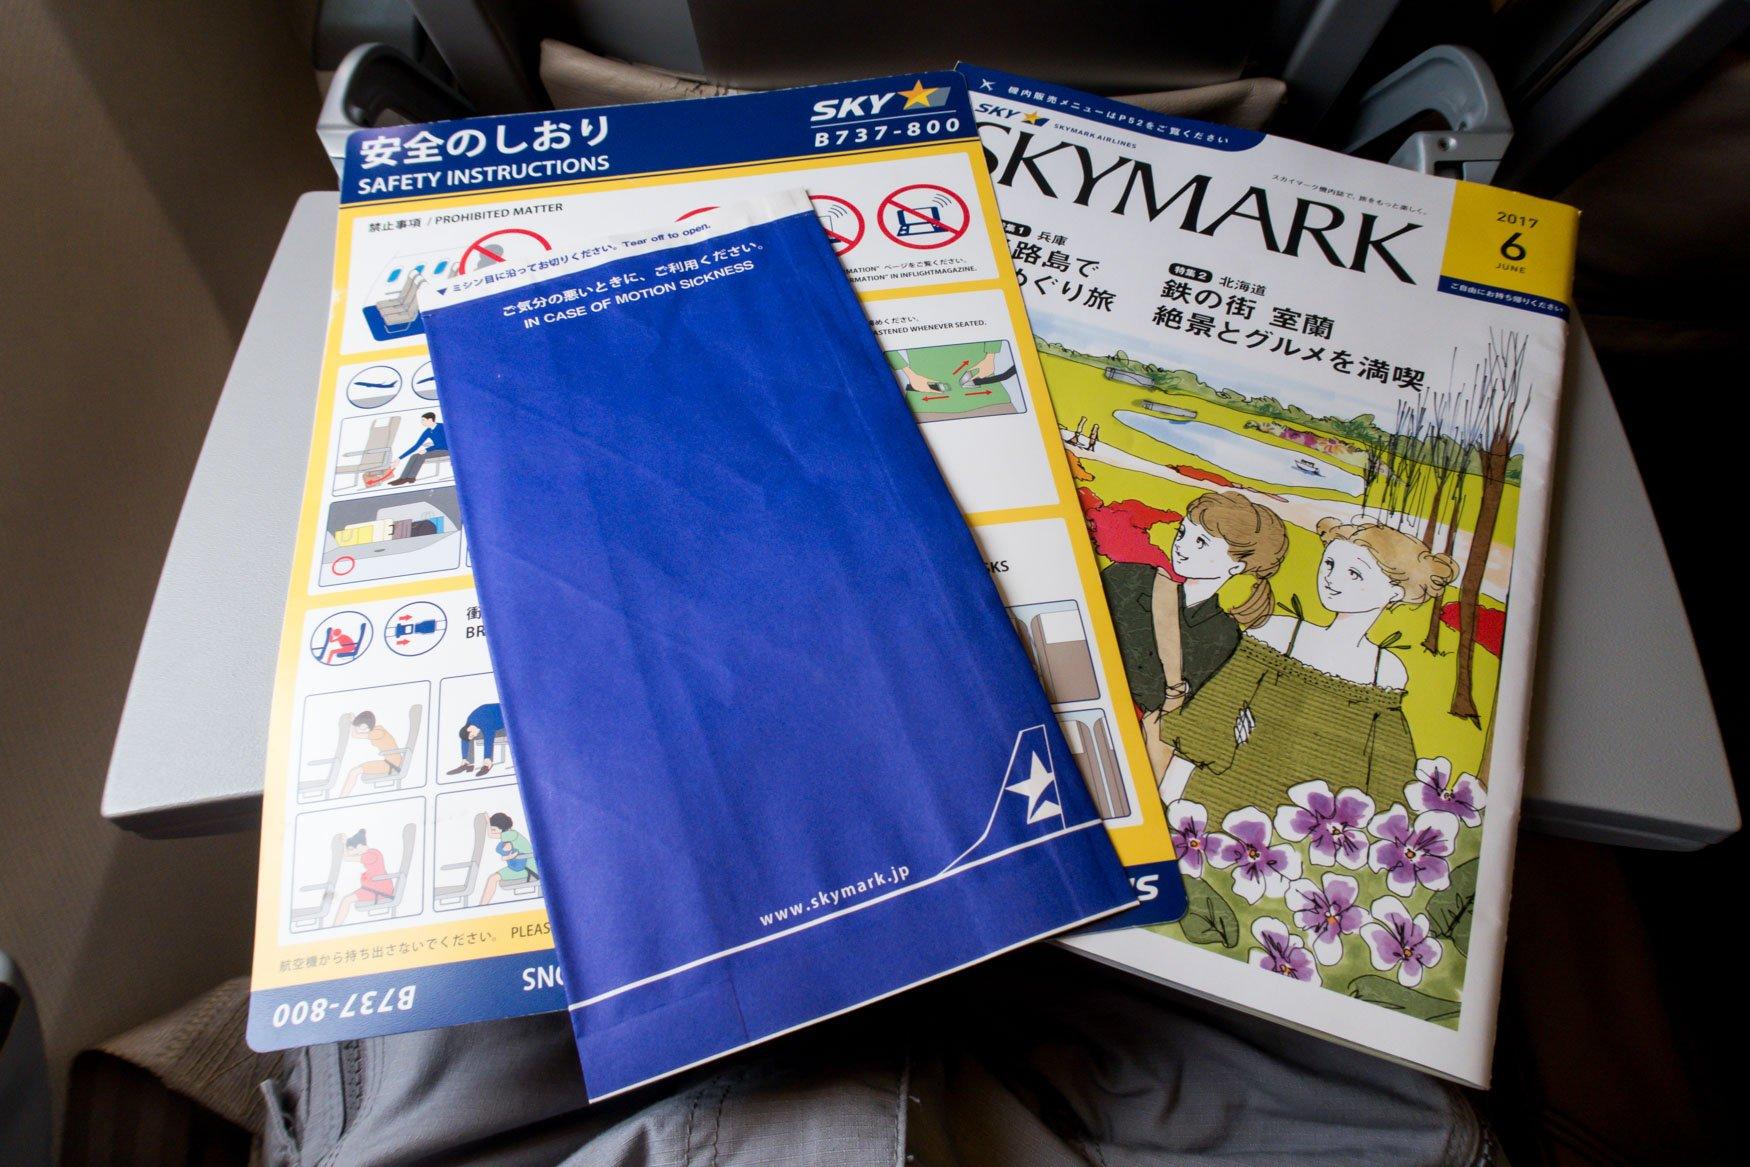 Skymark Airlines In-Flight Magazine